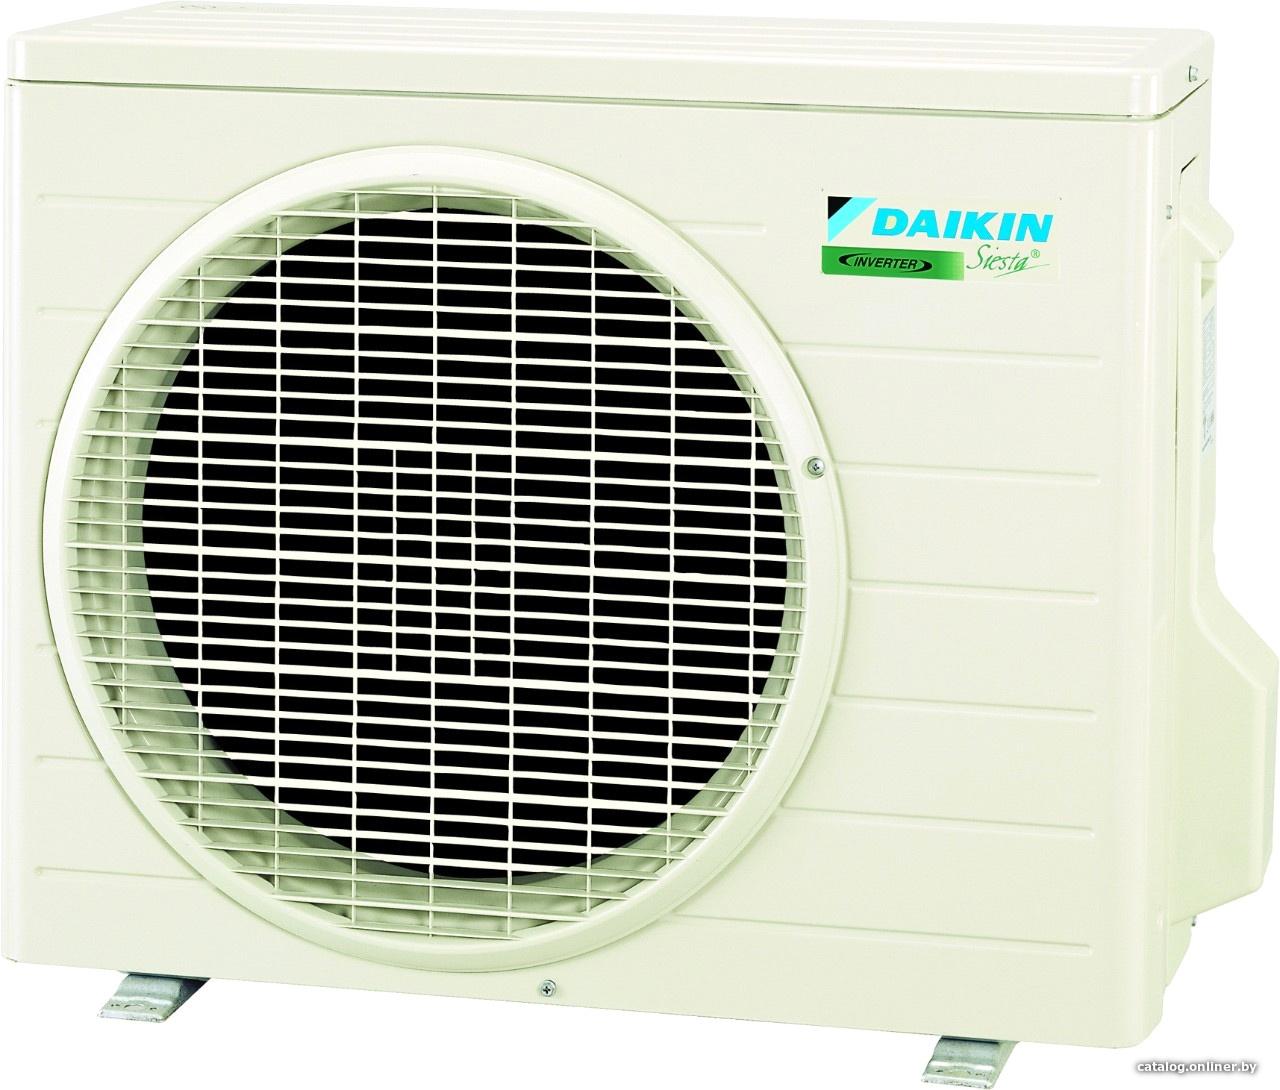 Daikin-Siesta-ATXP25K3ARXP25K3-5